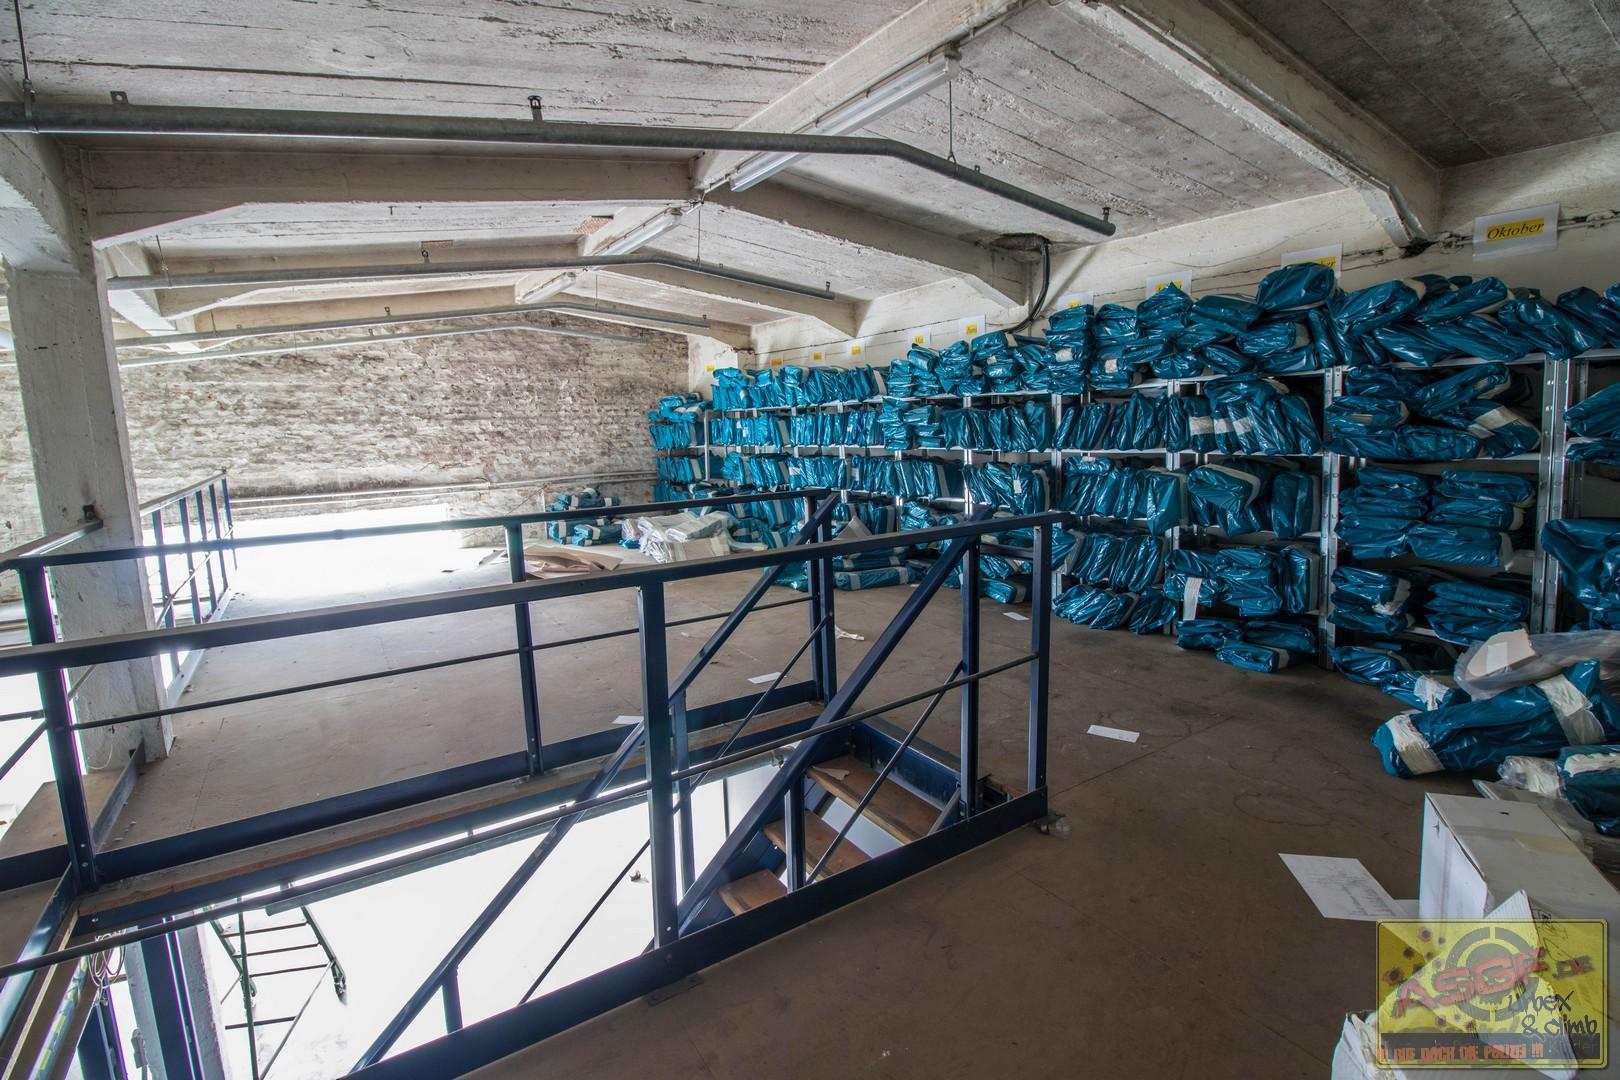 papierfabrik10032019-32